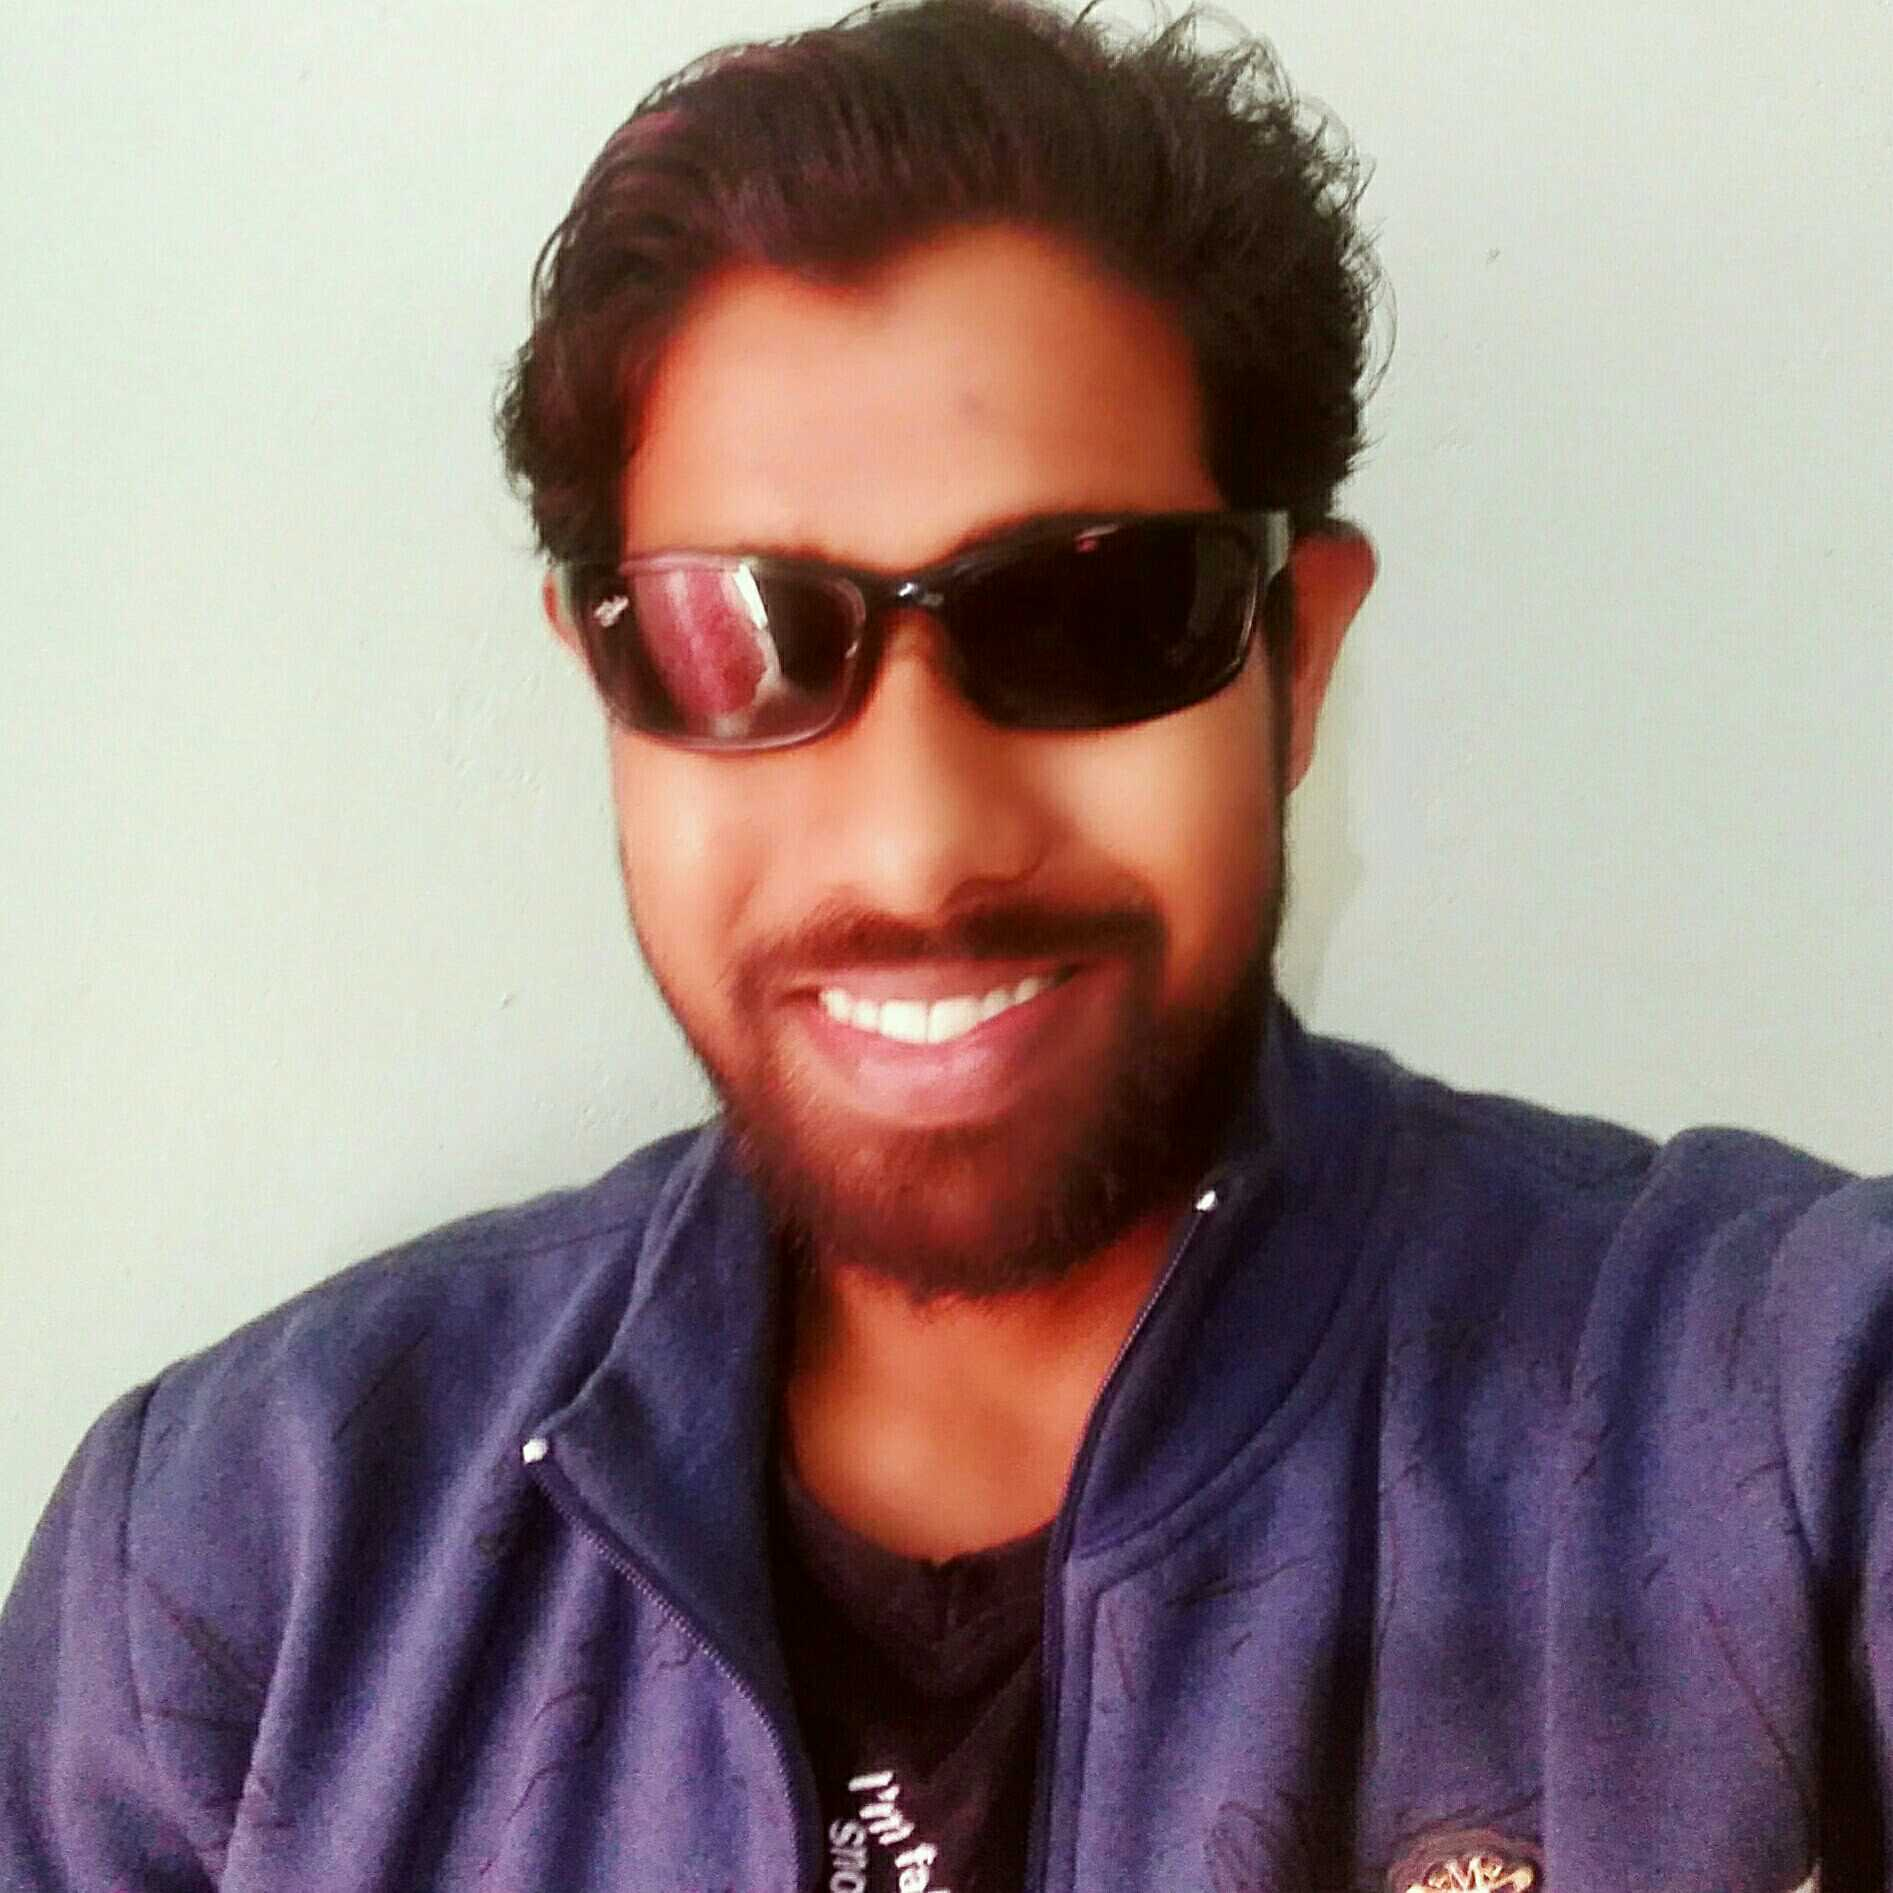 Alarayan Khan Poet Singer Songwriter Actor Tune maker                          (WhatsApp-91 9365139507)